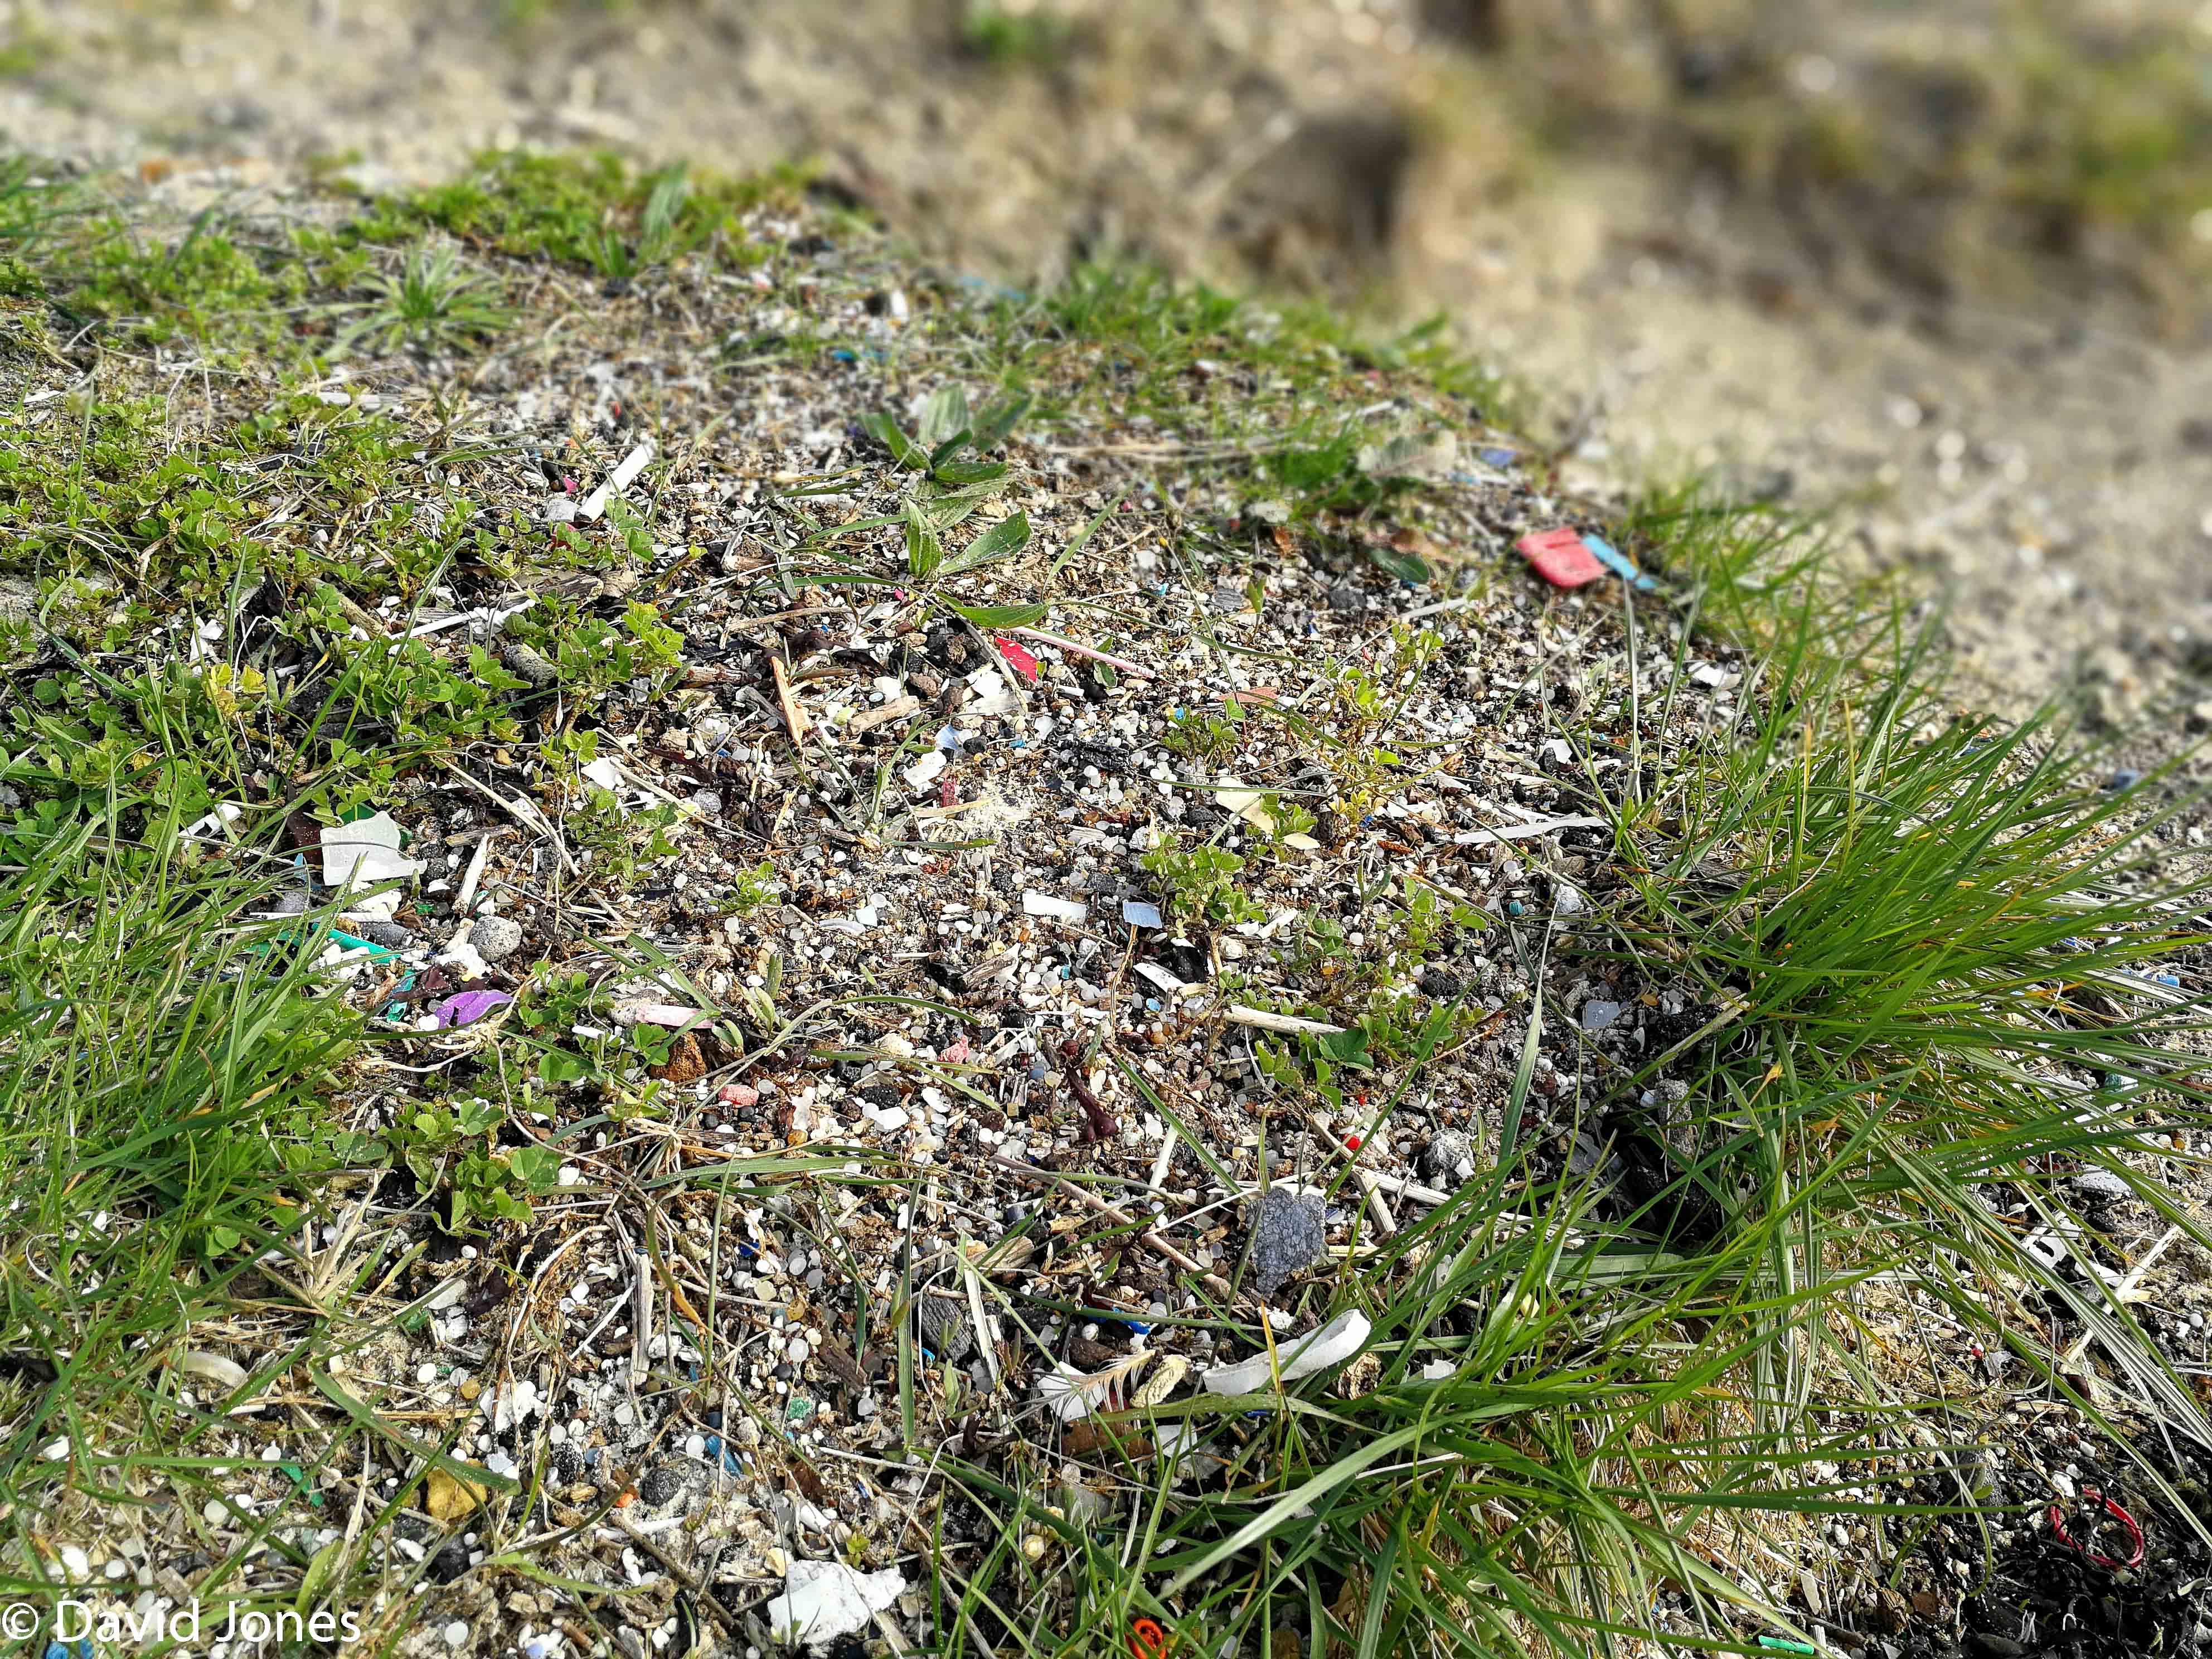 Langstone Harbour microplastics